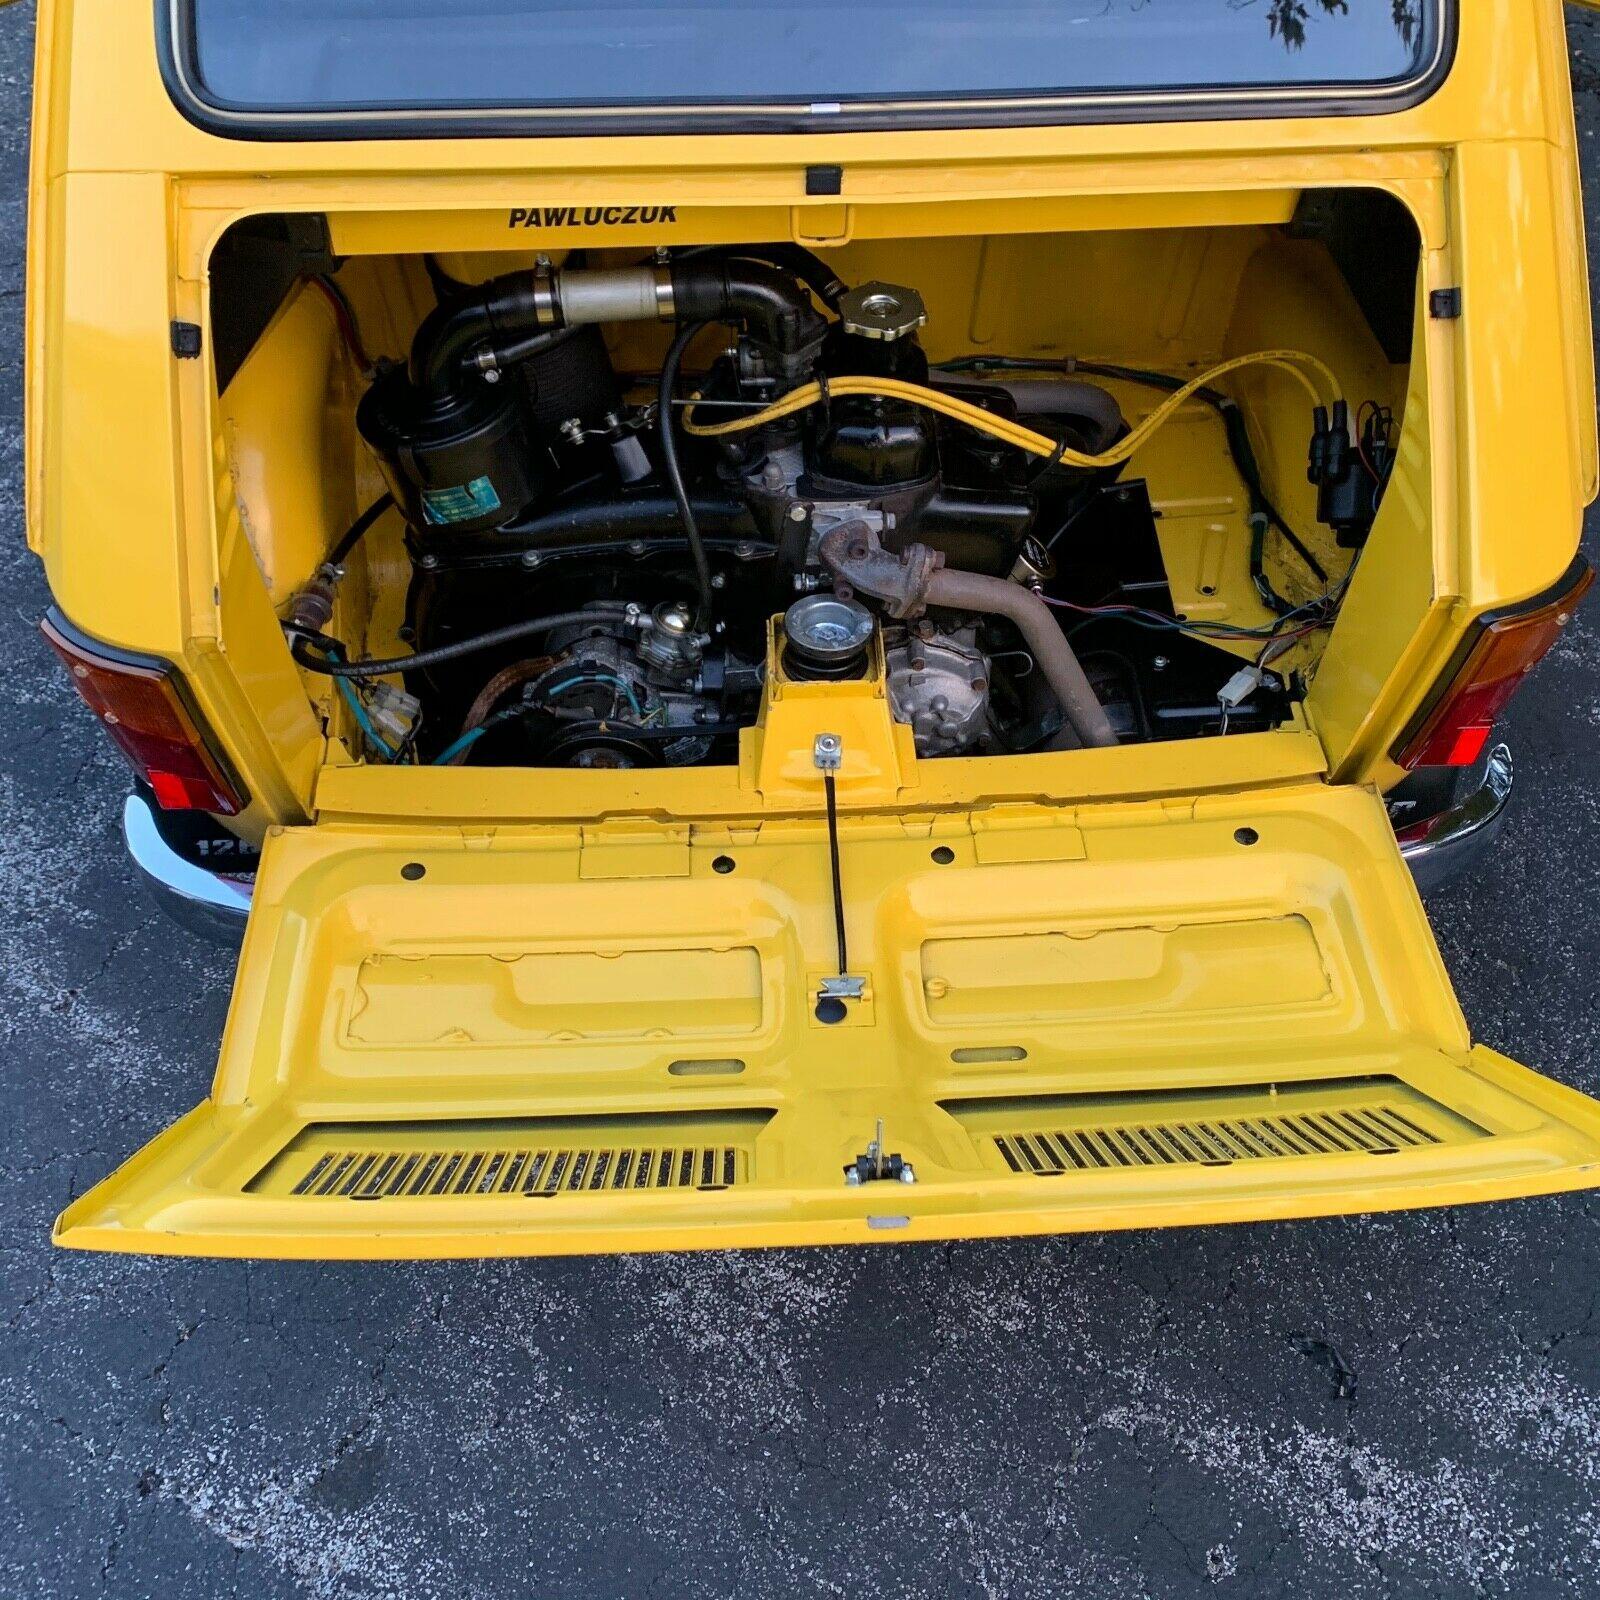 1976 Fiat 126 P engine